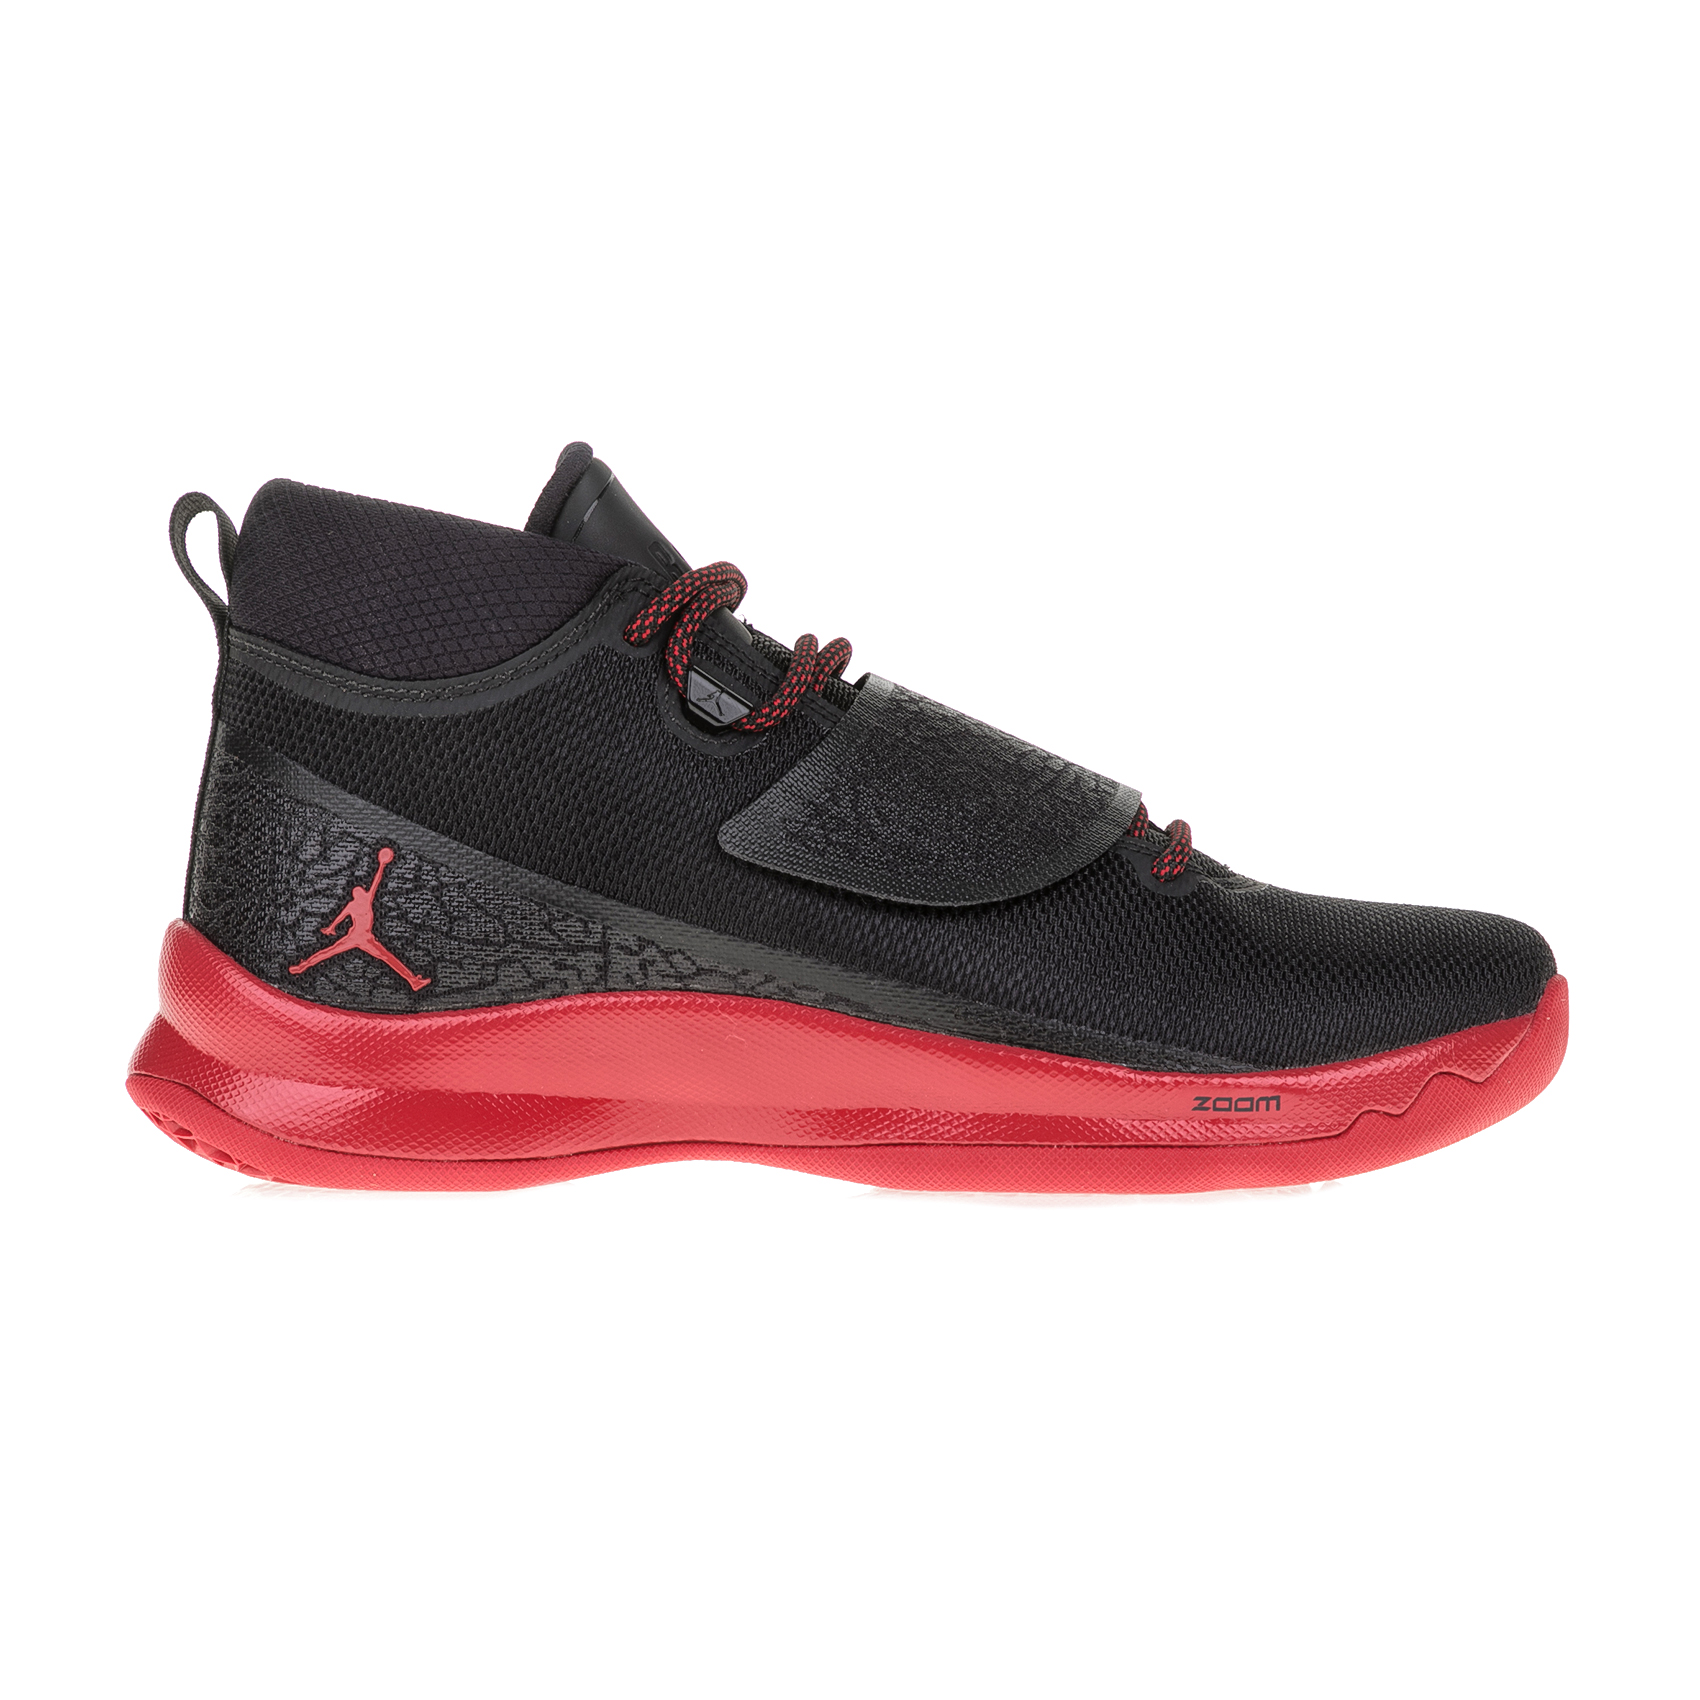 NIKE - Ανδρικά παπούτσια μπάσκετ ΝΙΚΕ JORDAN SUPER.FLY 5 PO μαύρα-κόκκινα ανδρικά παπούτσια αθλητικά basketball